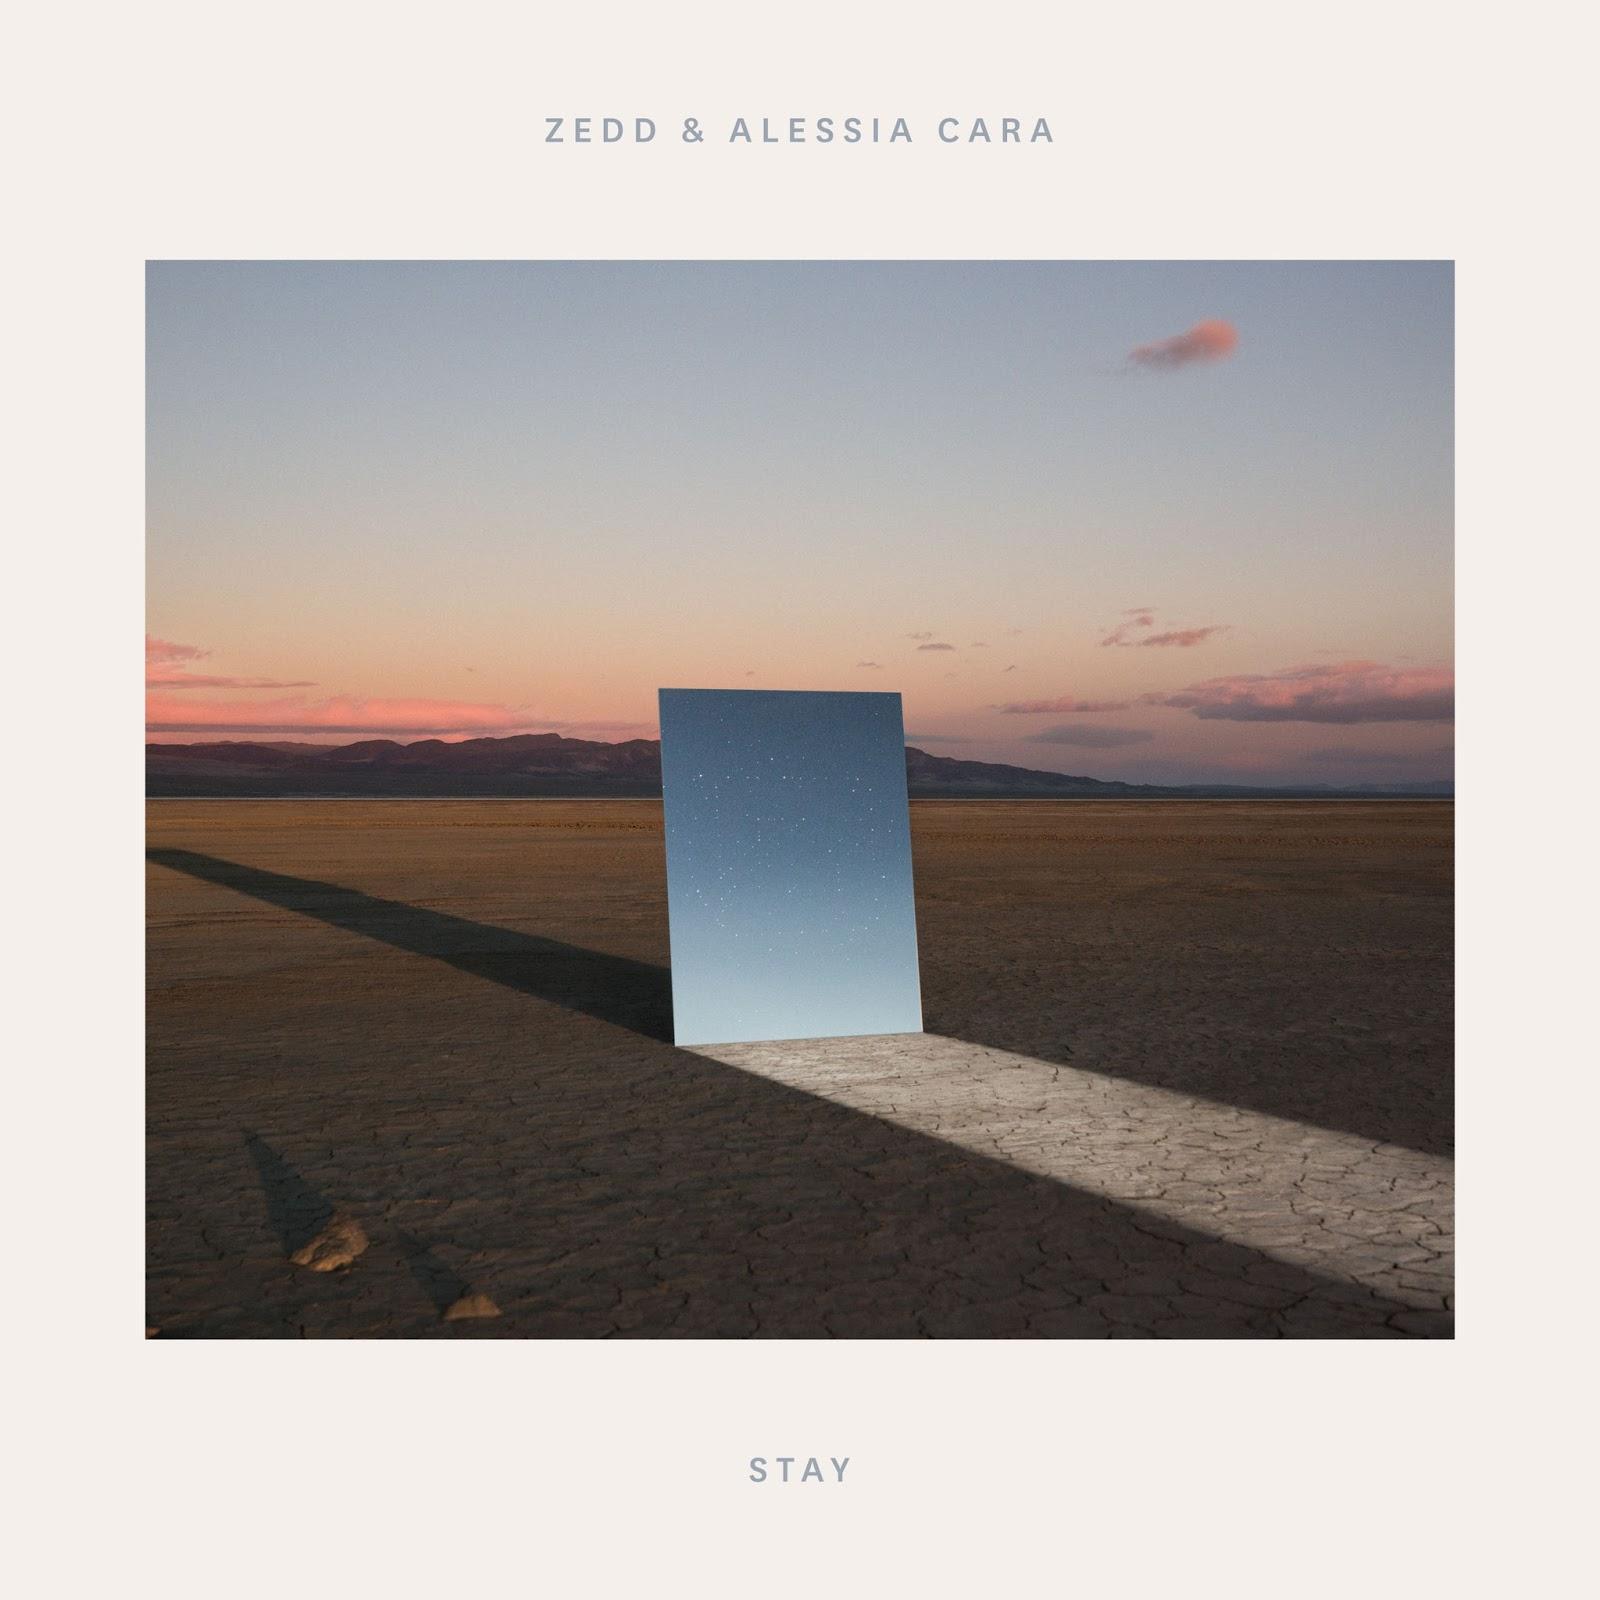 Zedd & Alessia Cara – Stay